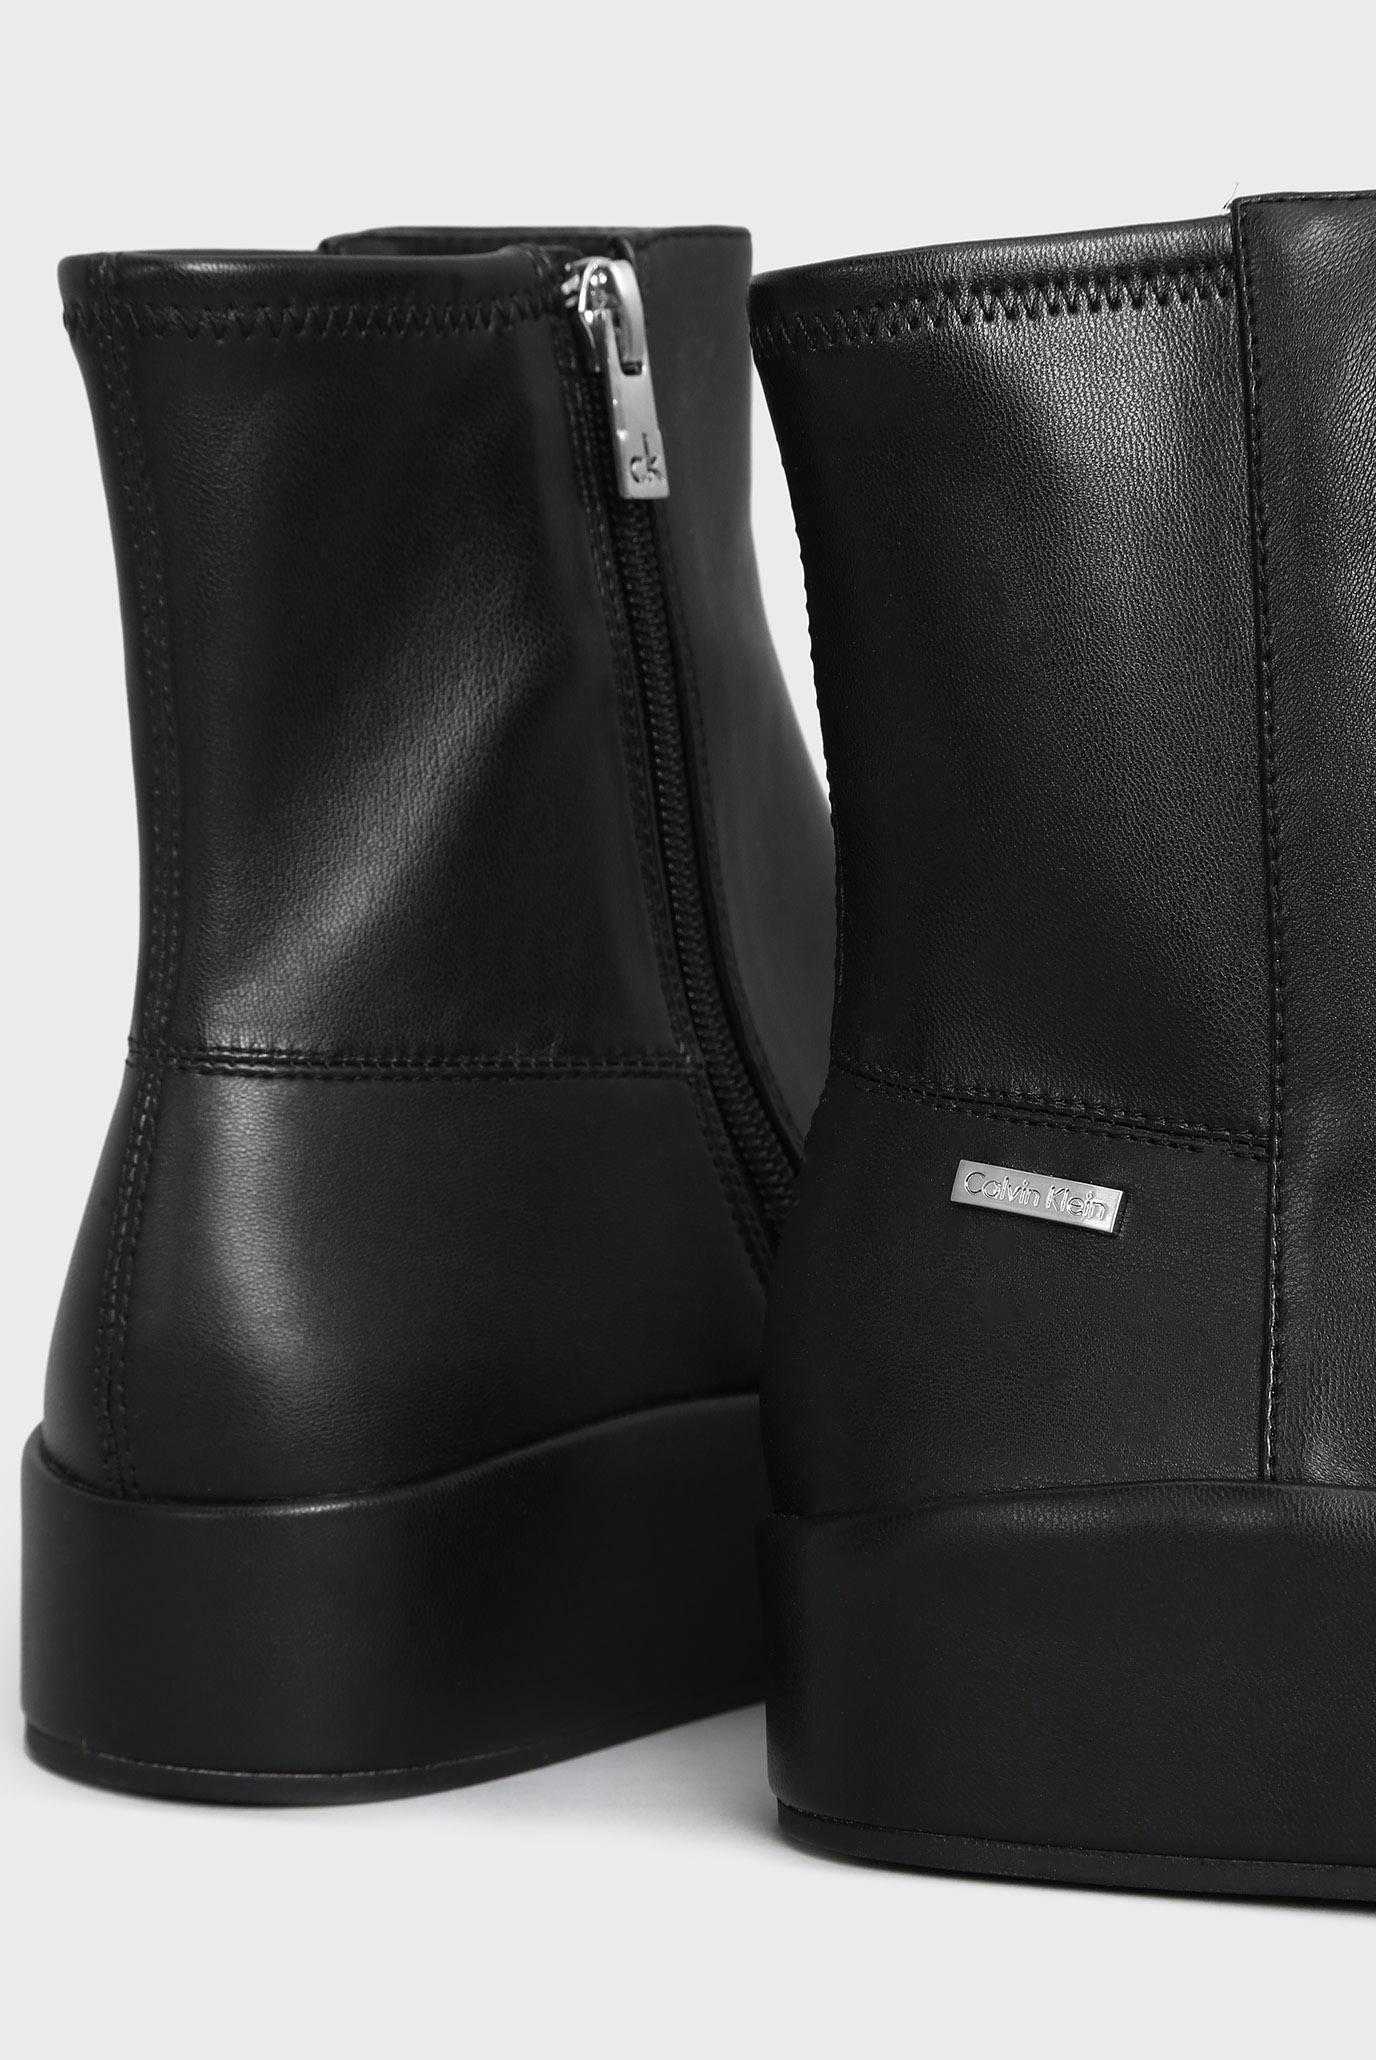 550330d08 Купить Женские черные ботинки на платформе Calvin Klein Calvin Klein E5906  – Киев, Украина. Цены в интернет ...